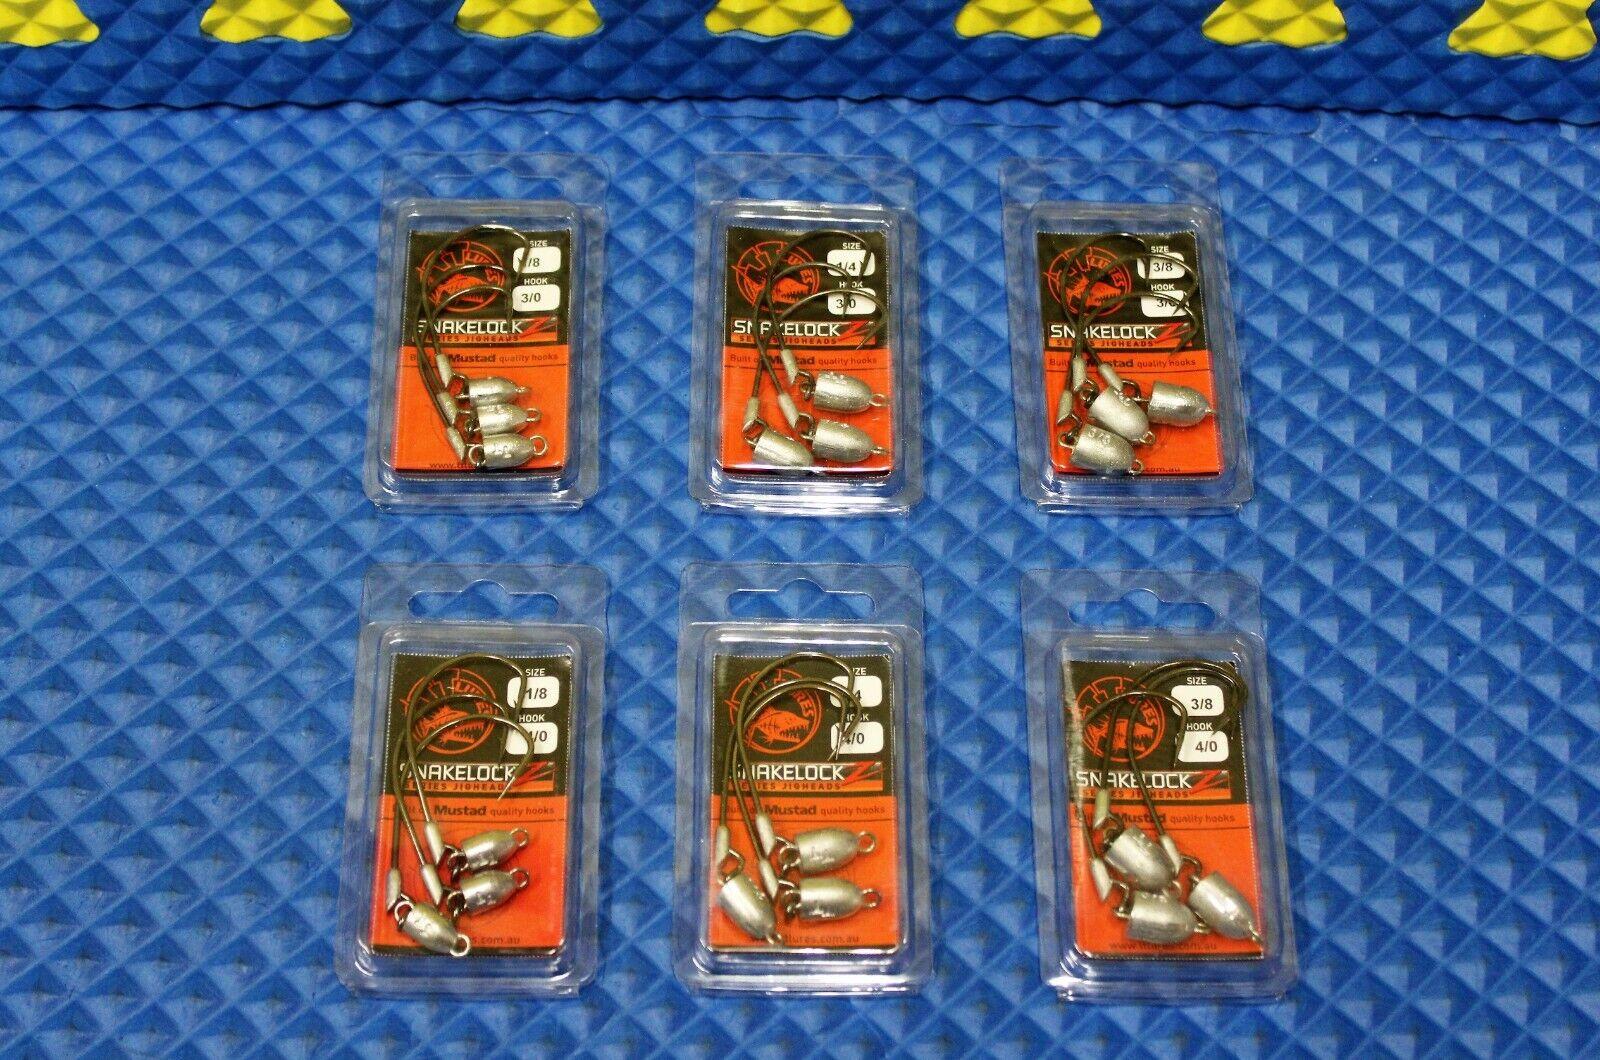 Z-Man Snakelockz Jigheads 3//0 Hooks 3-Pack CHOOSE YOUR WEIGHT